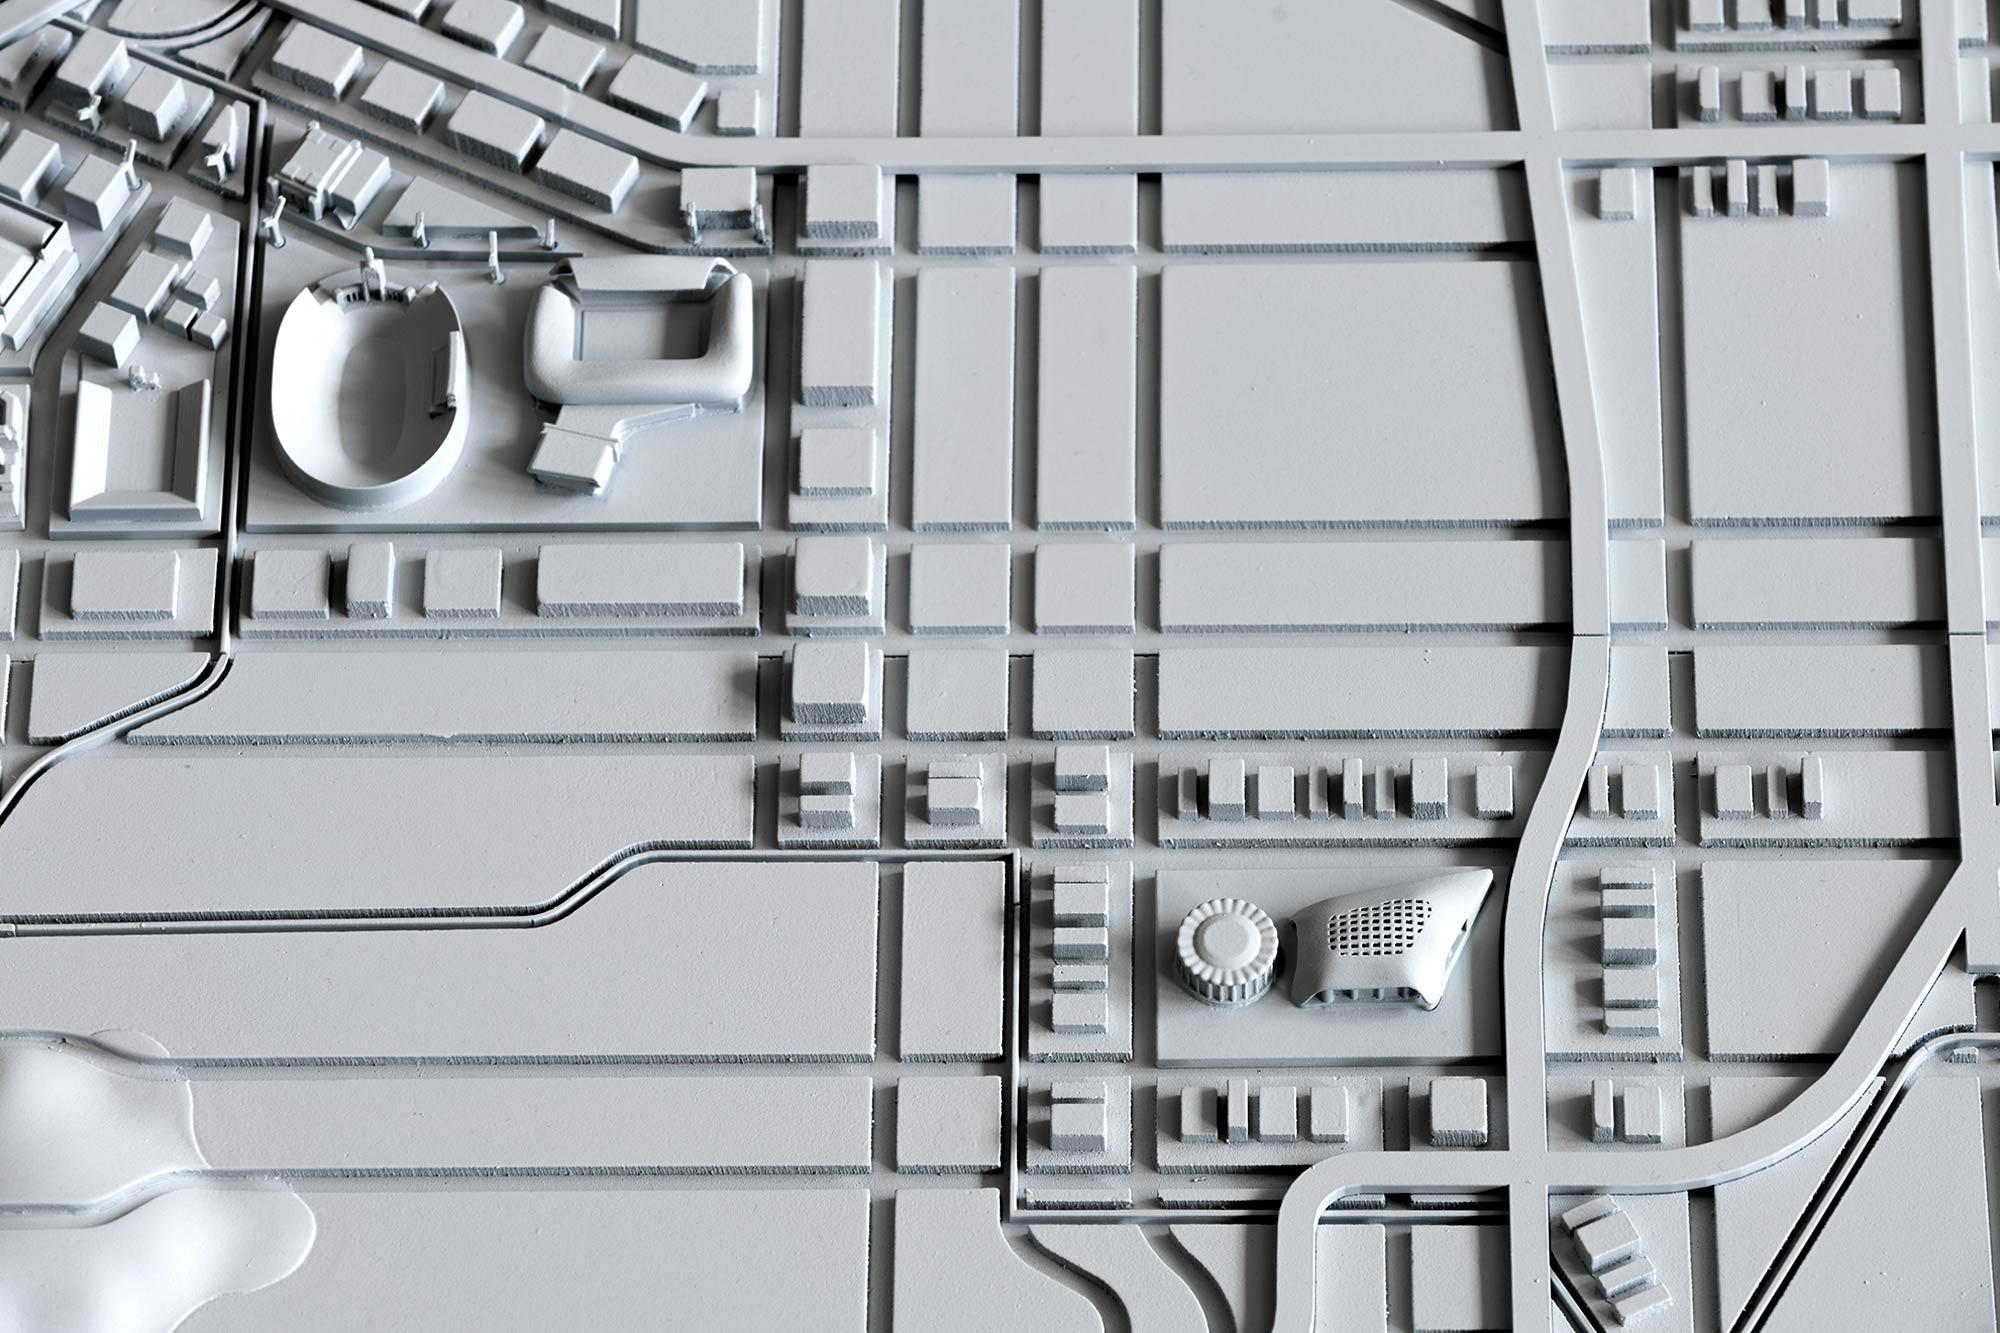 Los-Angeles-2028_-Maquetas-_-EXarchitects_10